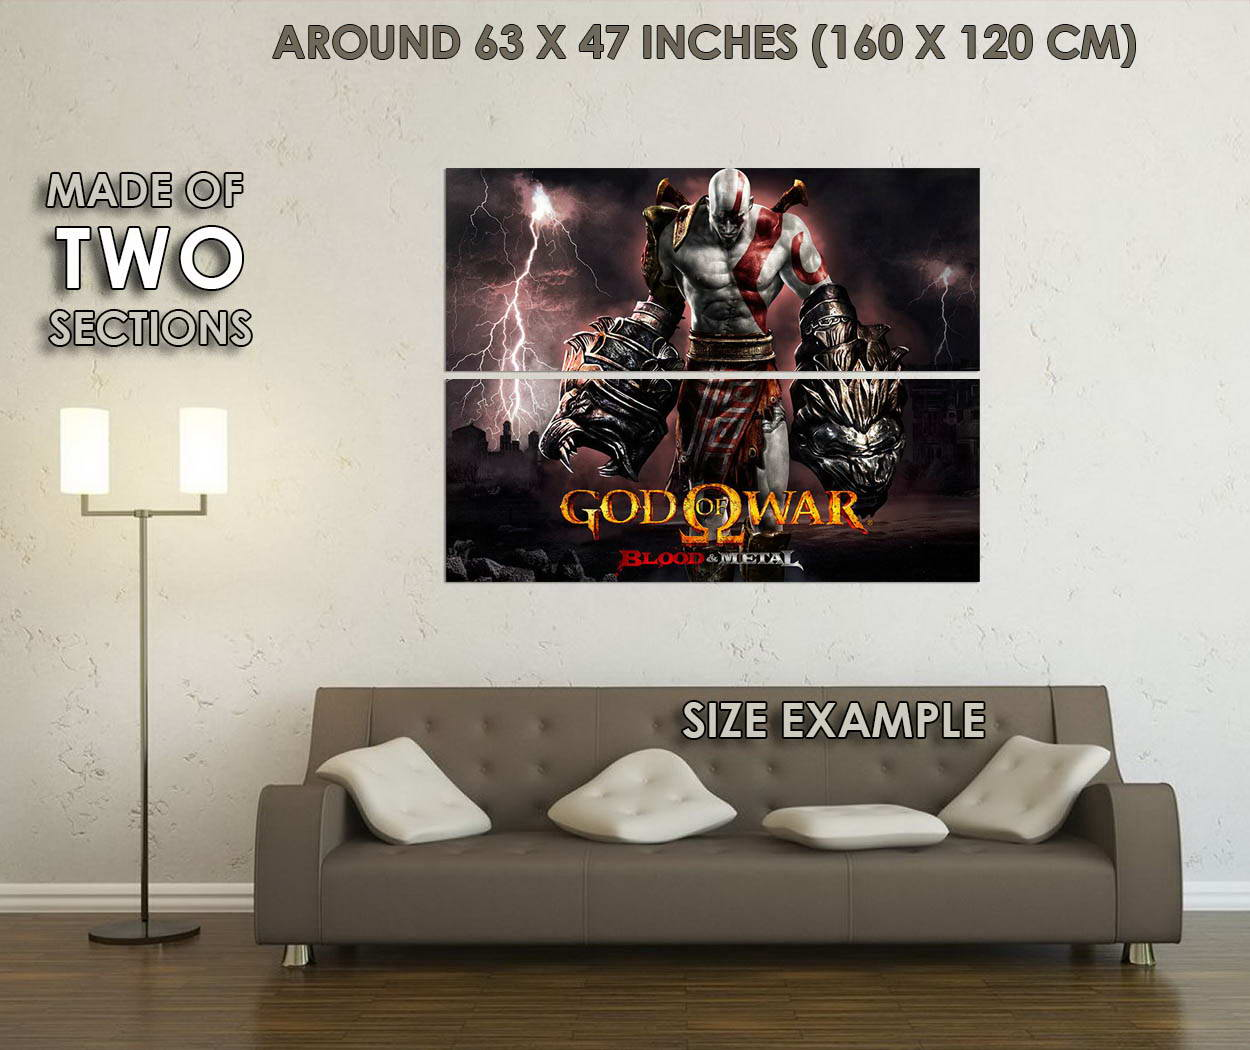 10679-Kratos-God-of-War-4-Game-LAMINATED-POSTER-CA thumbnail 6